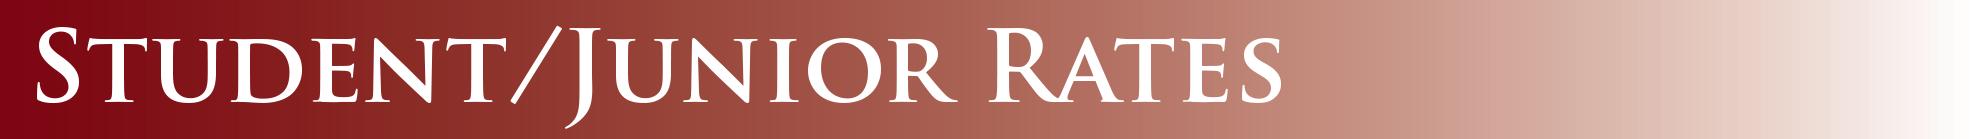 student_junior_rates_header